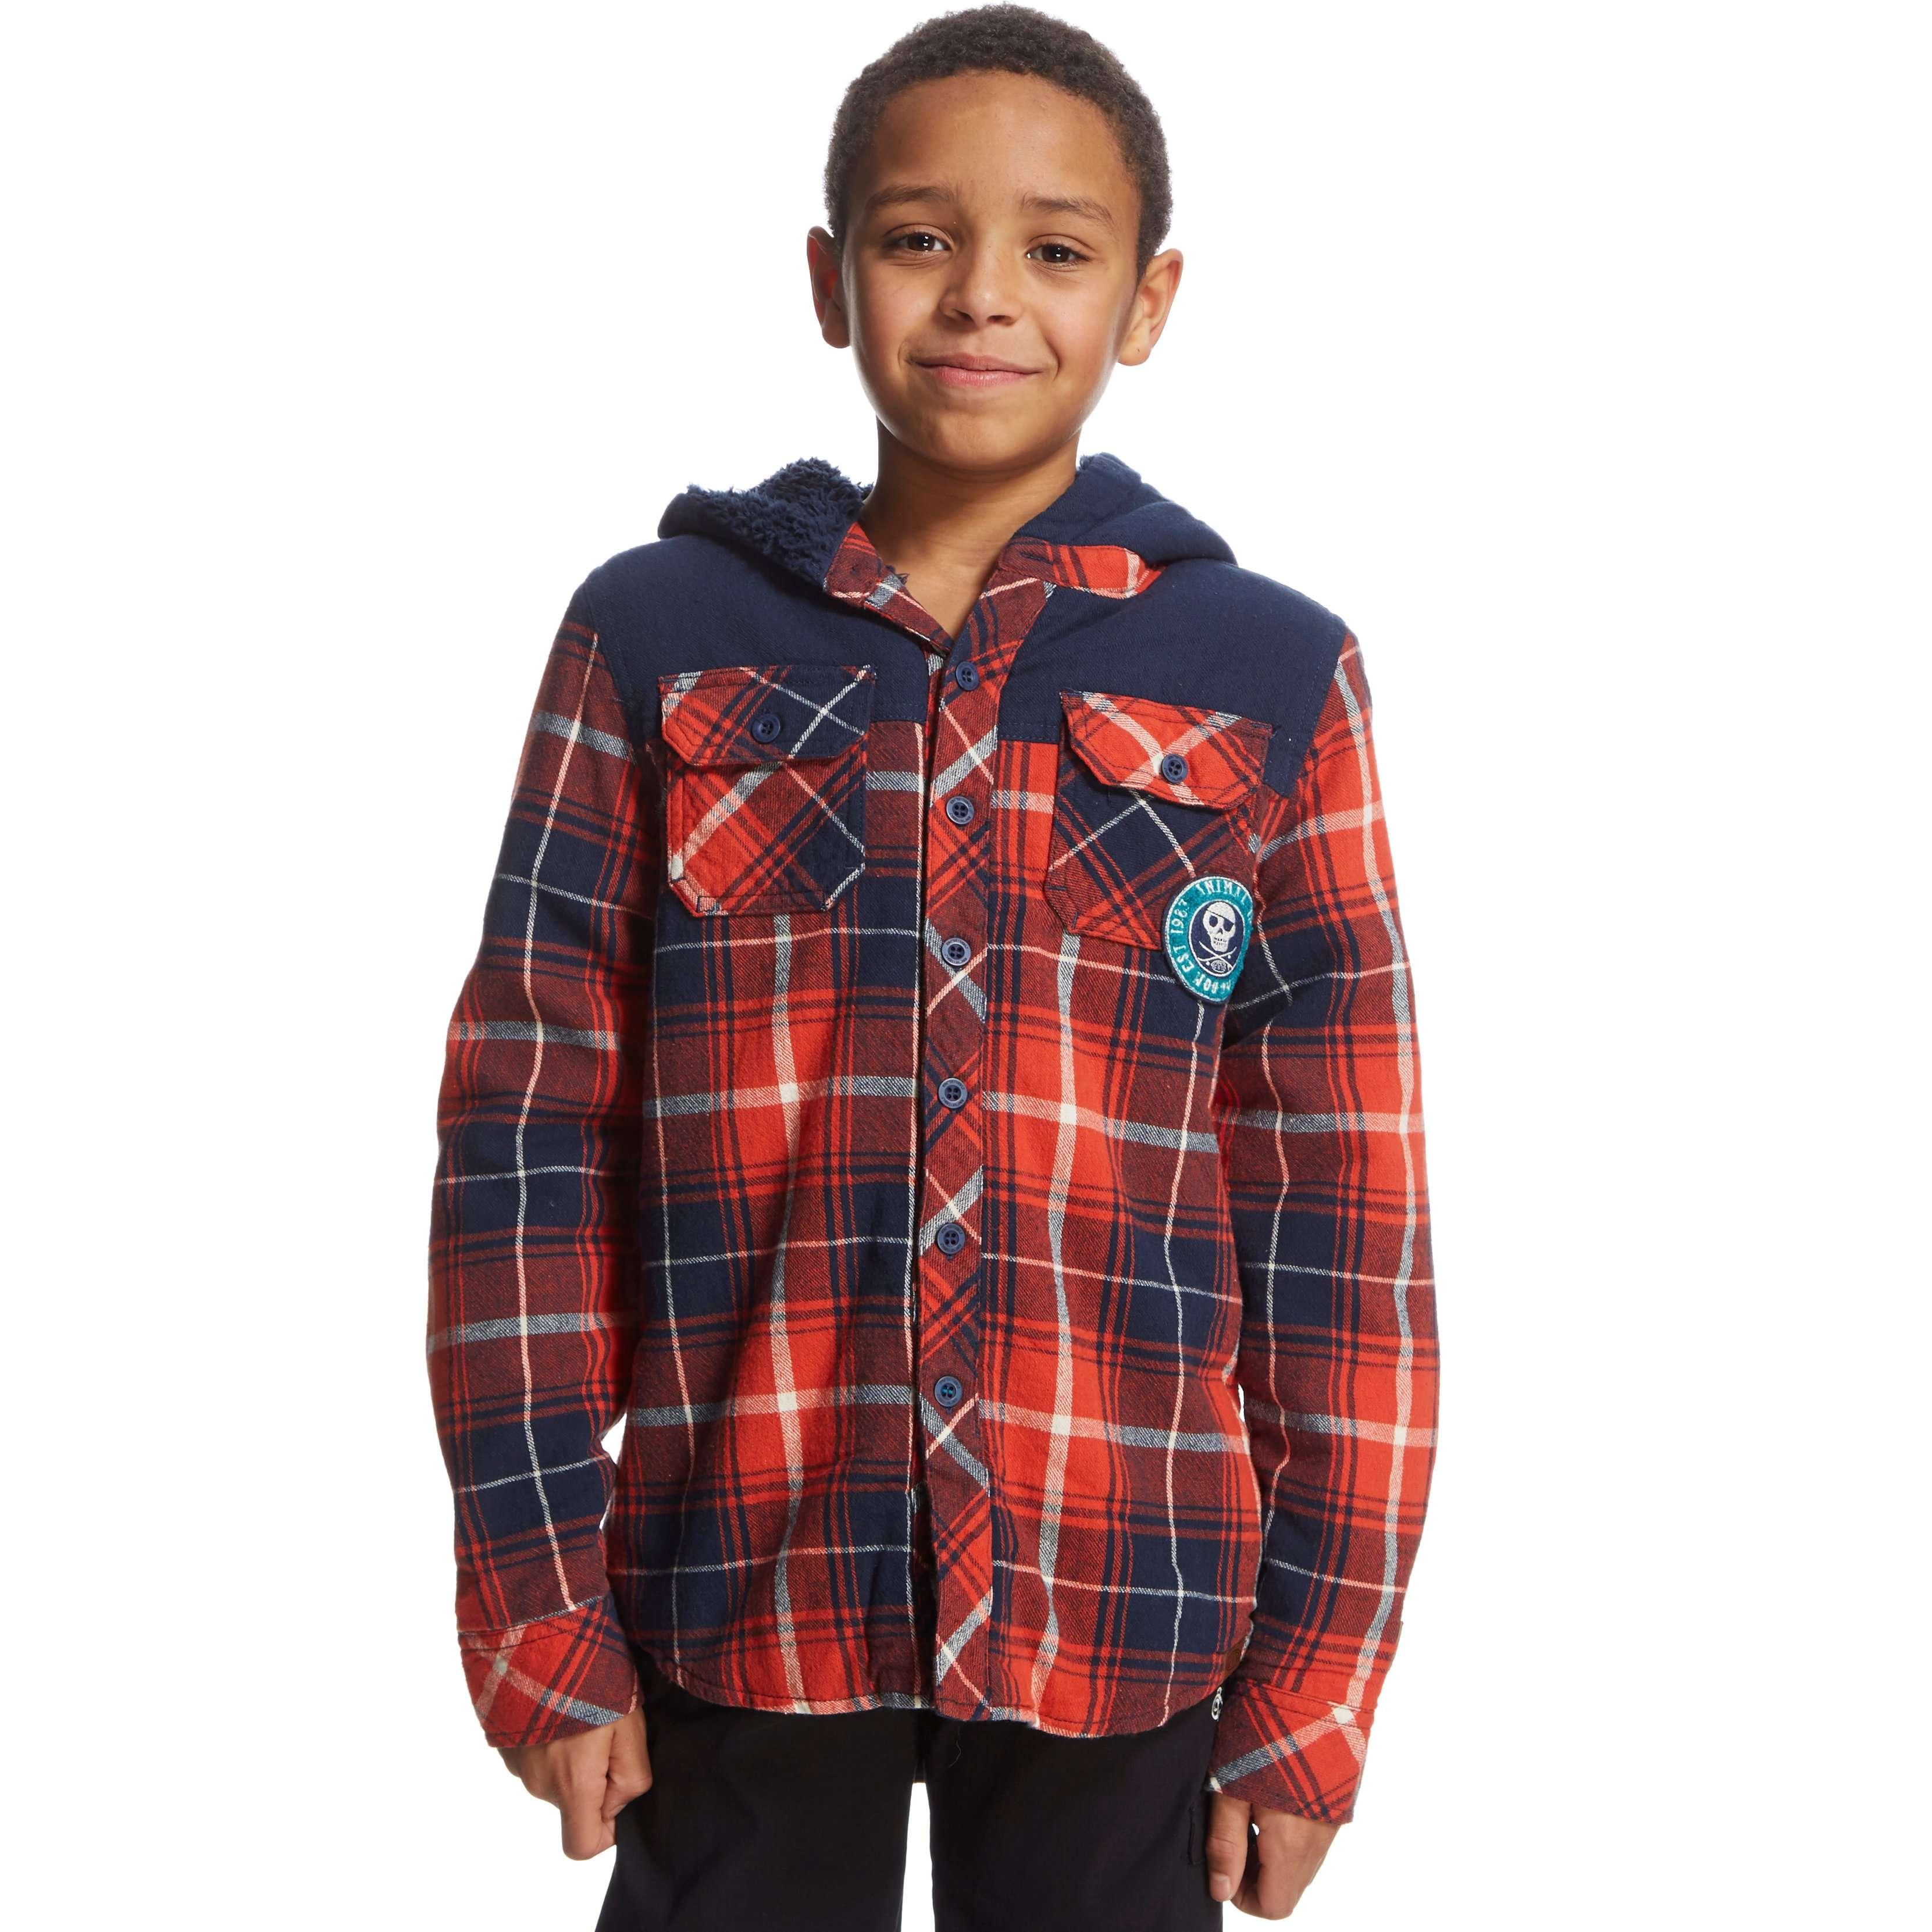 ANIMAL Boys Lumberjack Shirt